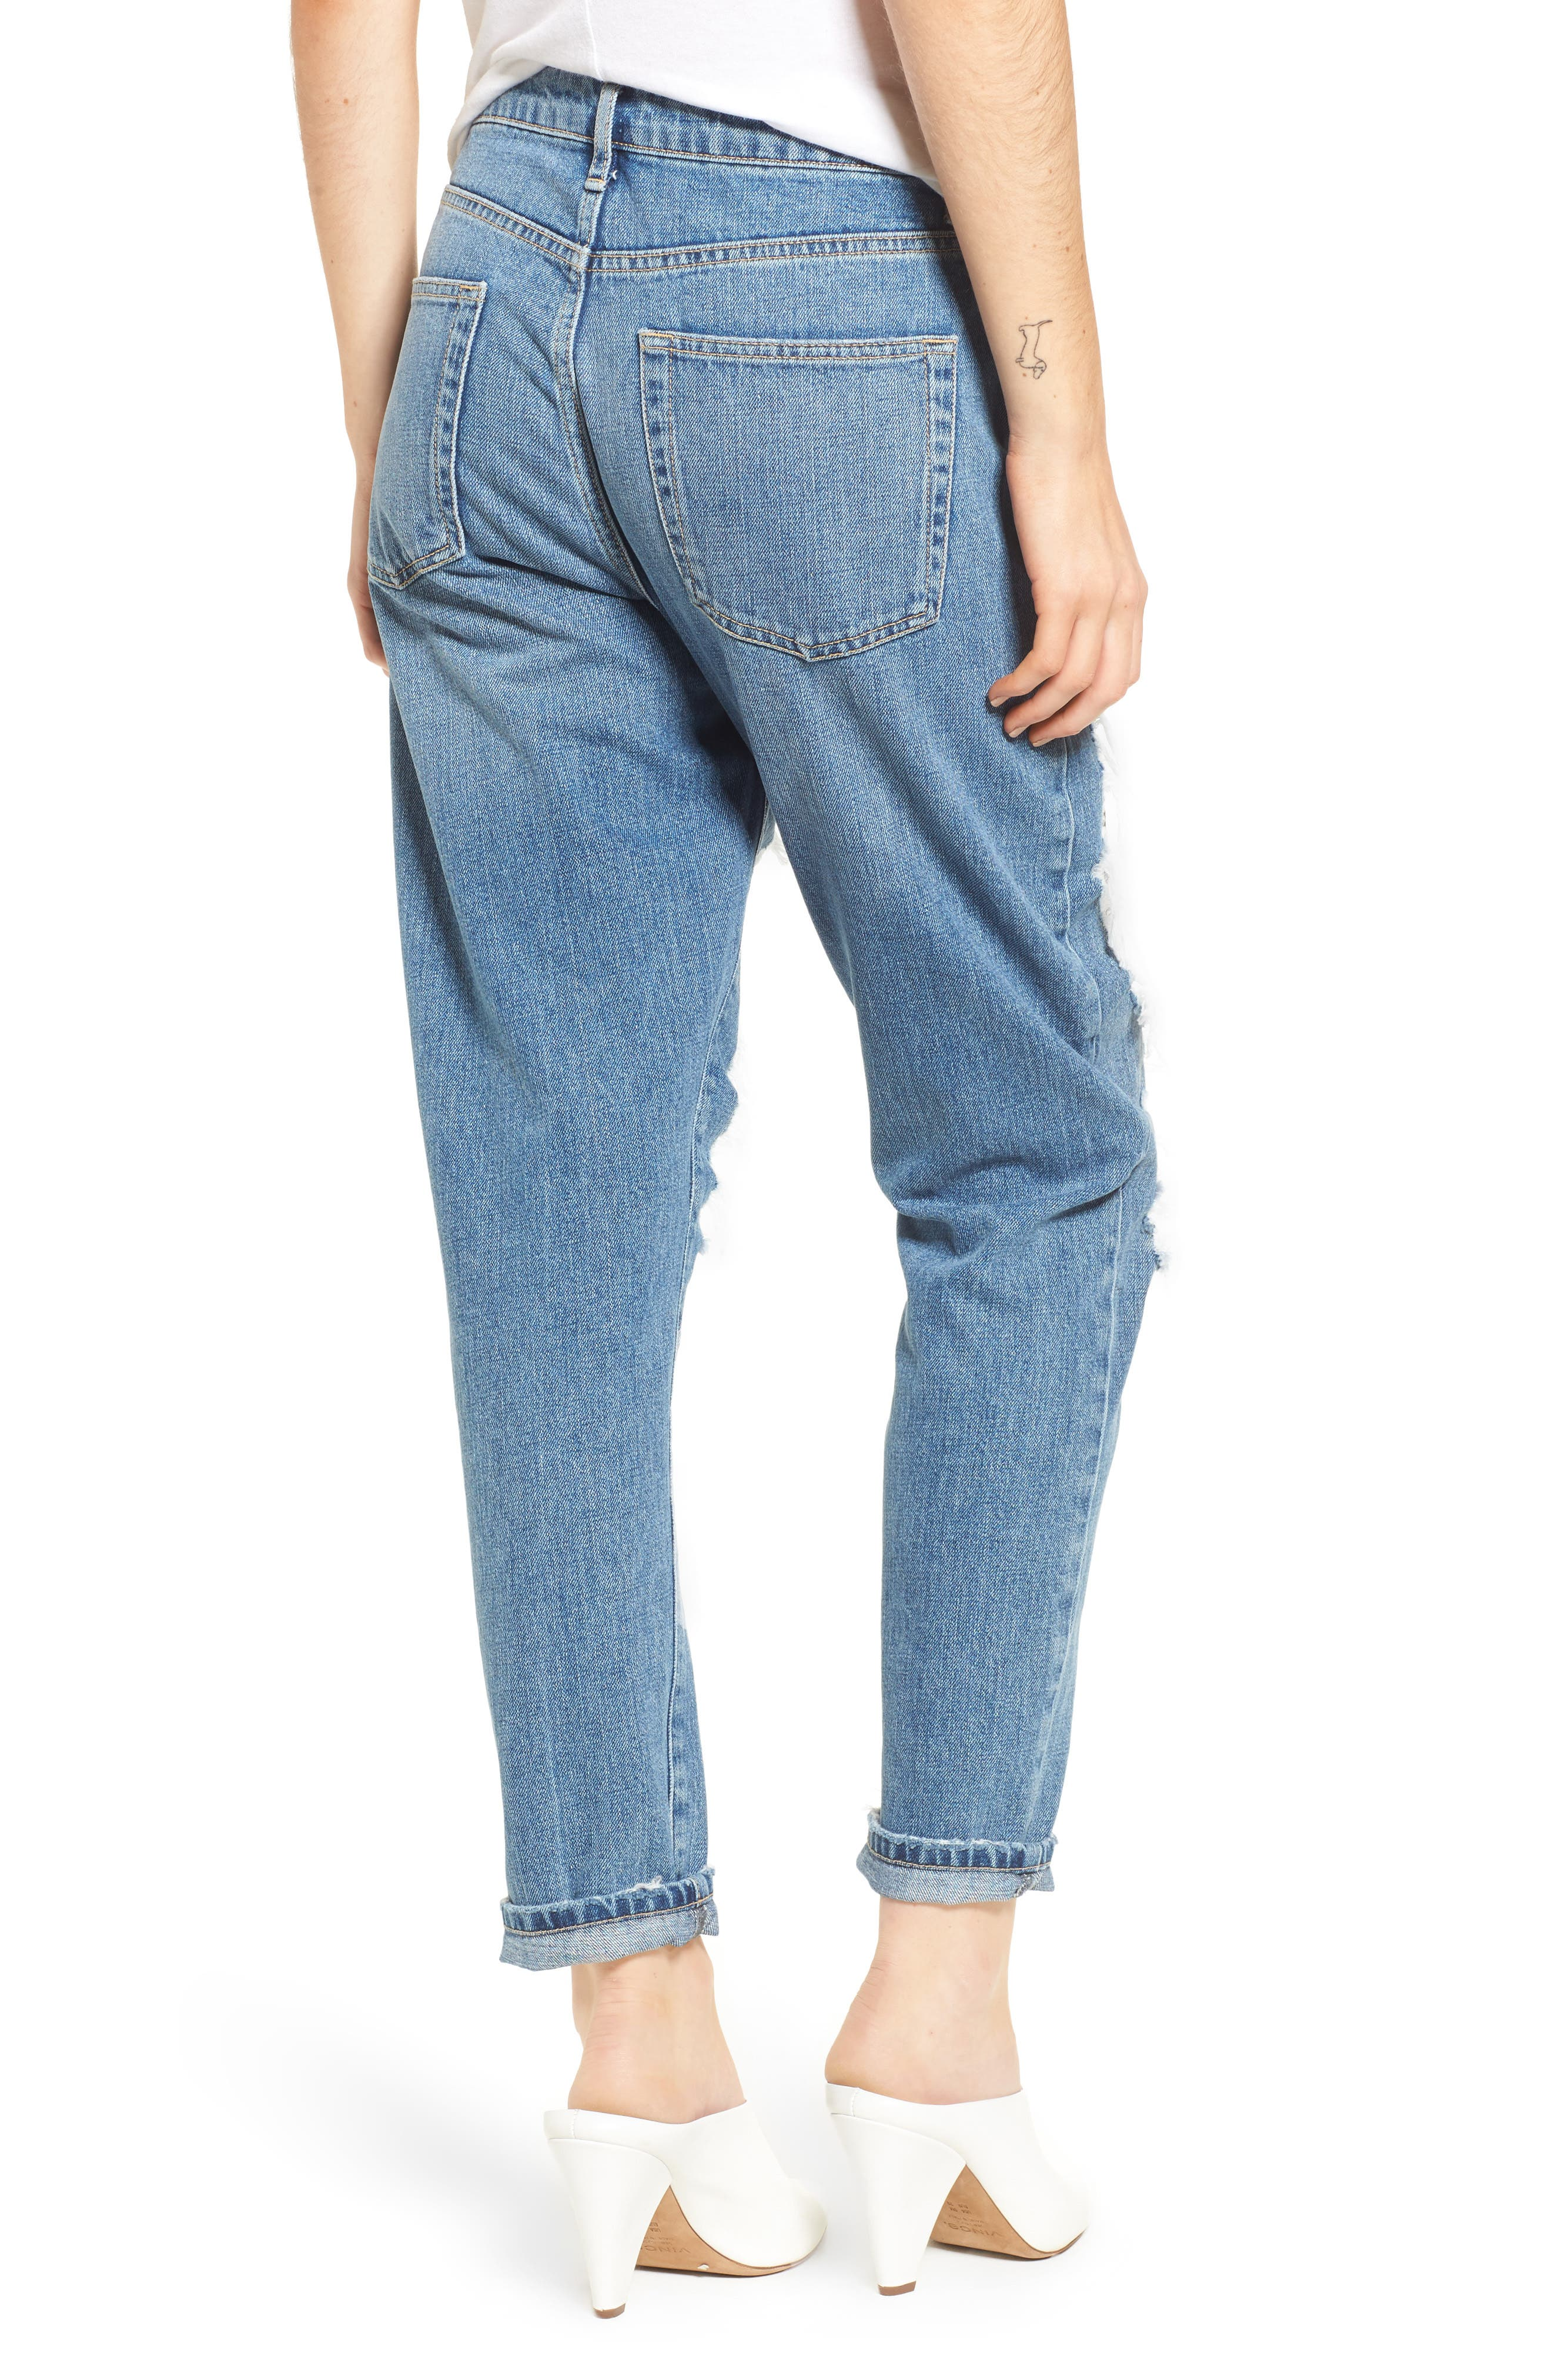 Chain Mail Boyfriend Jeans,                             Alternate thumbnail 3, color,                             Light Denim Multi